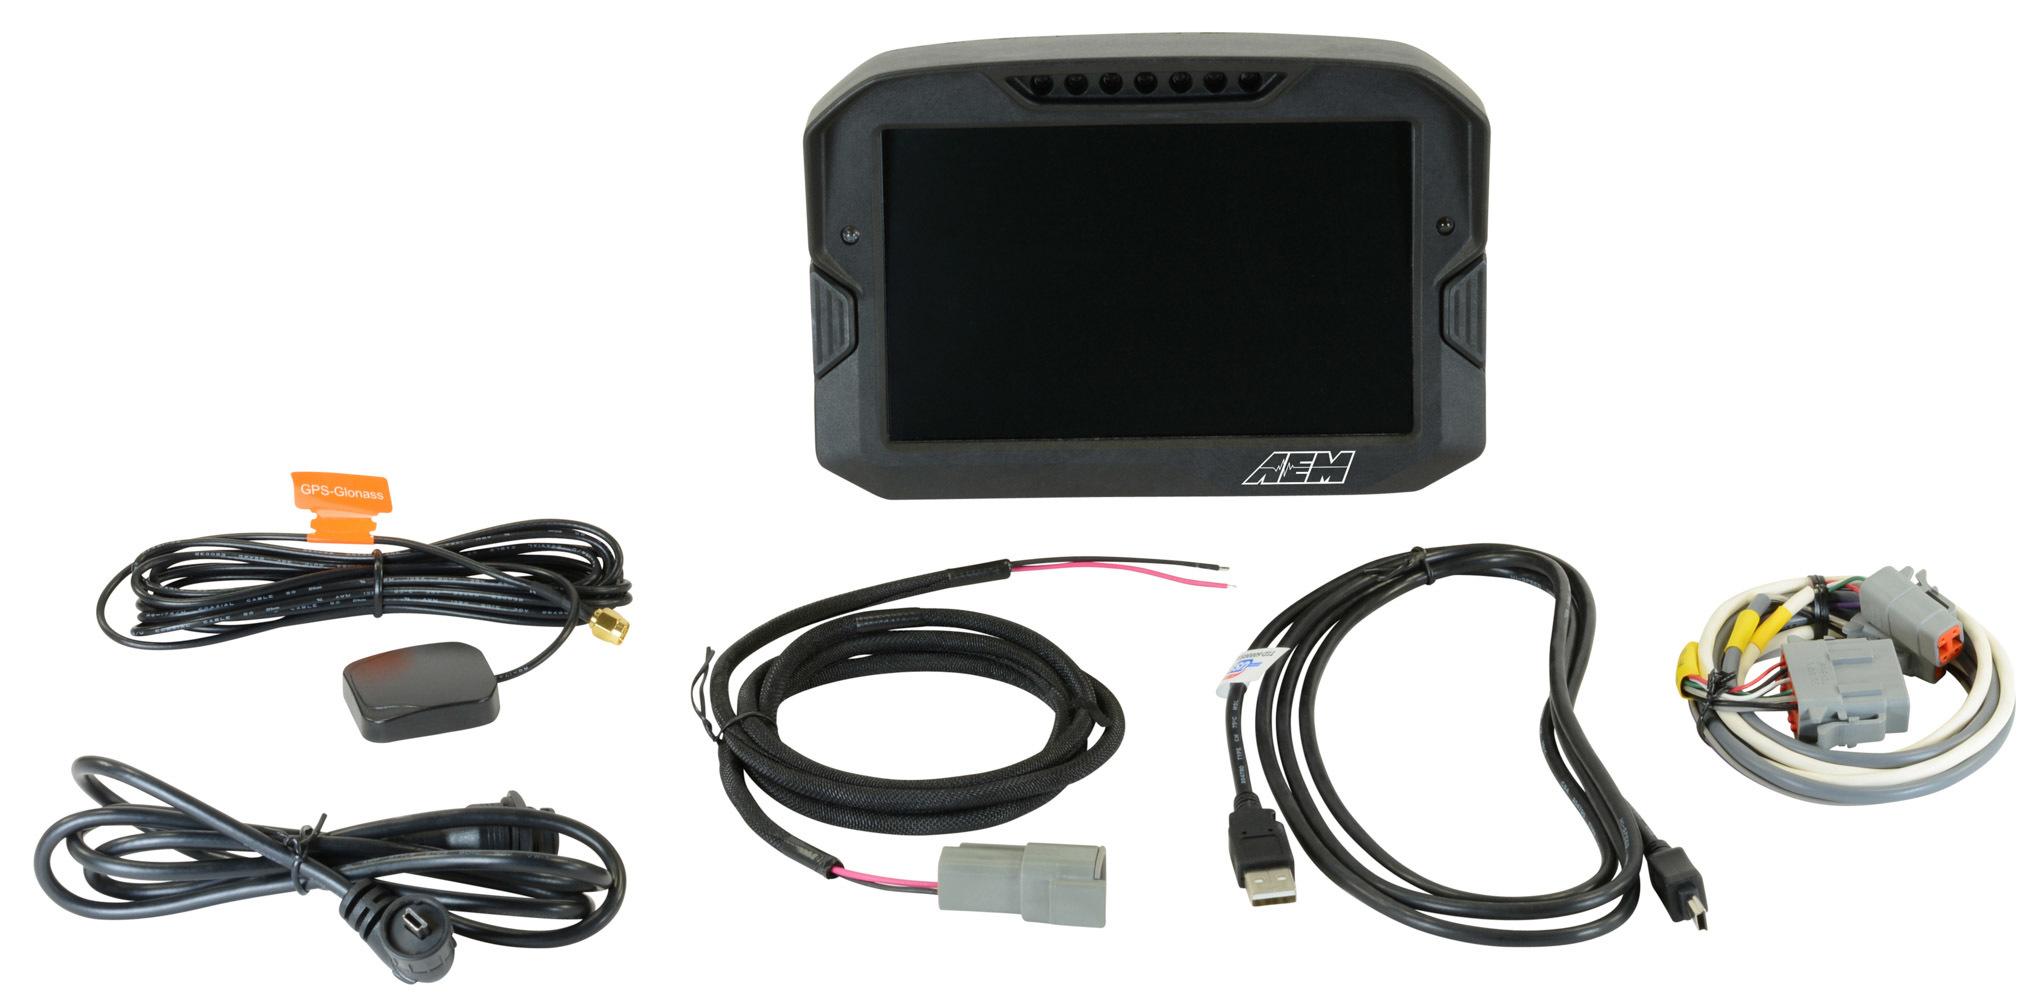 Aem Digital Dash Display  CD -7LG logging  GPS enable